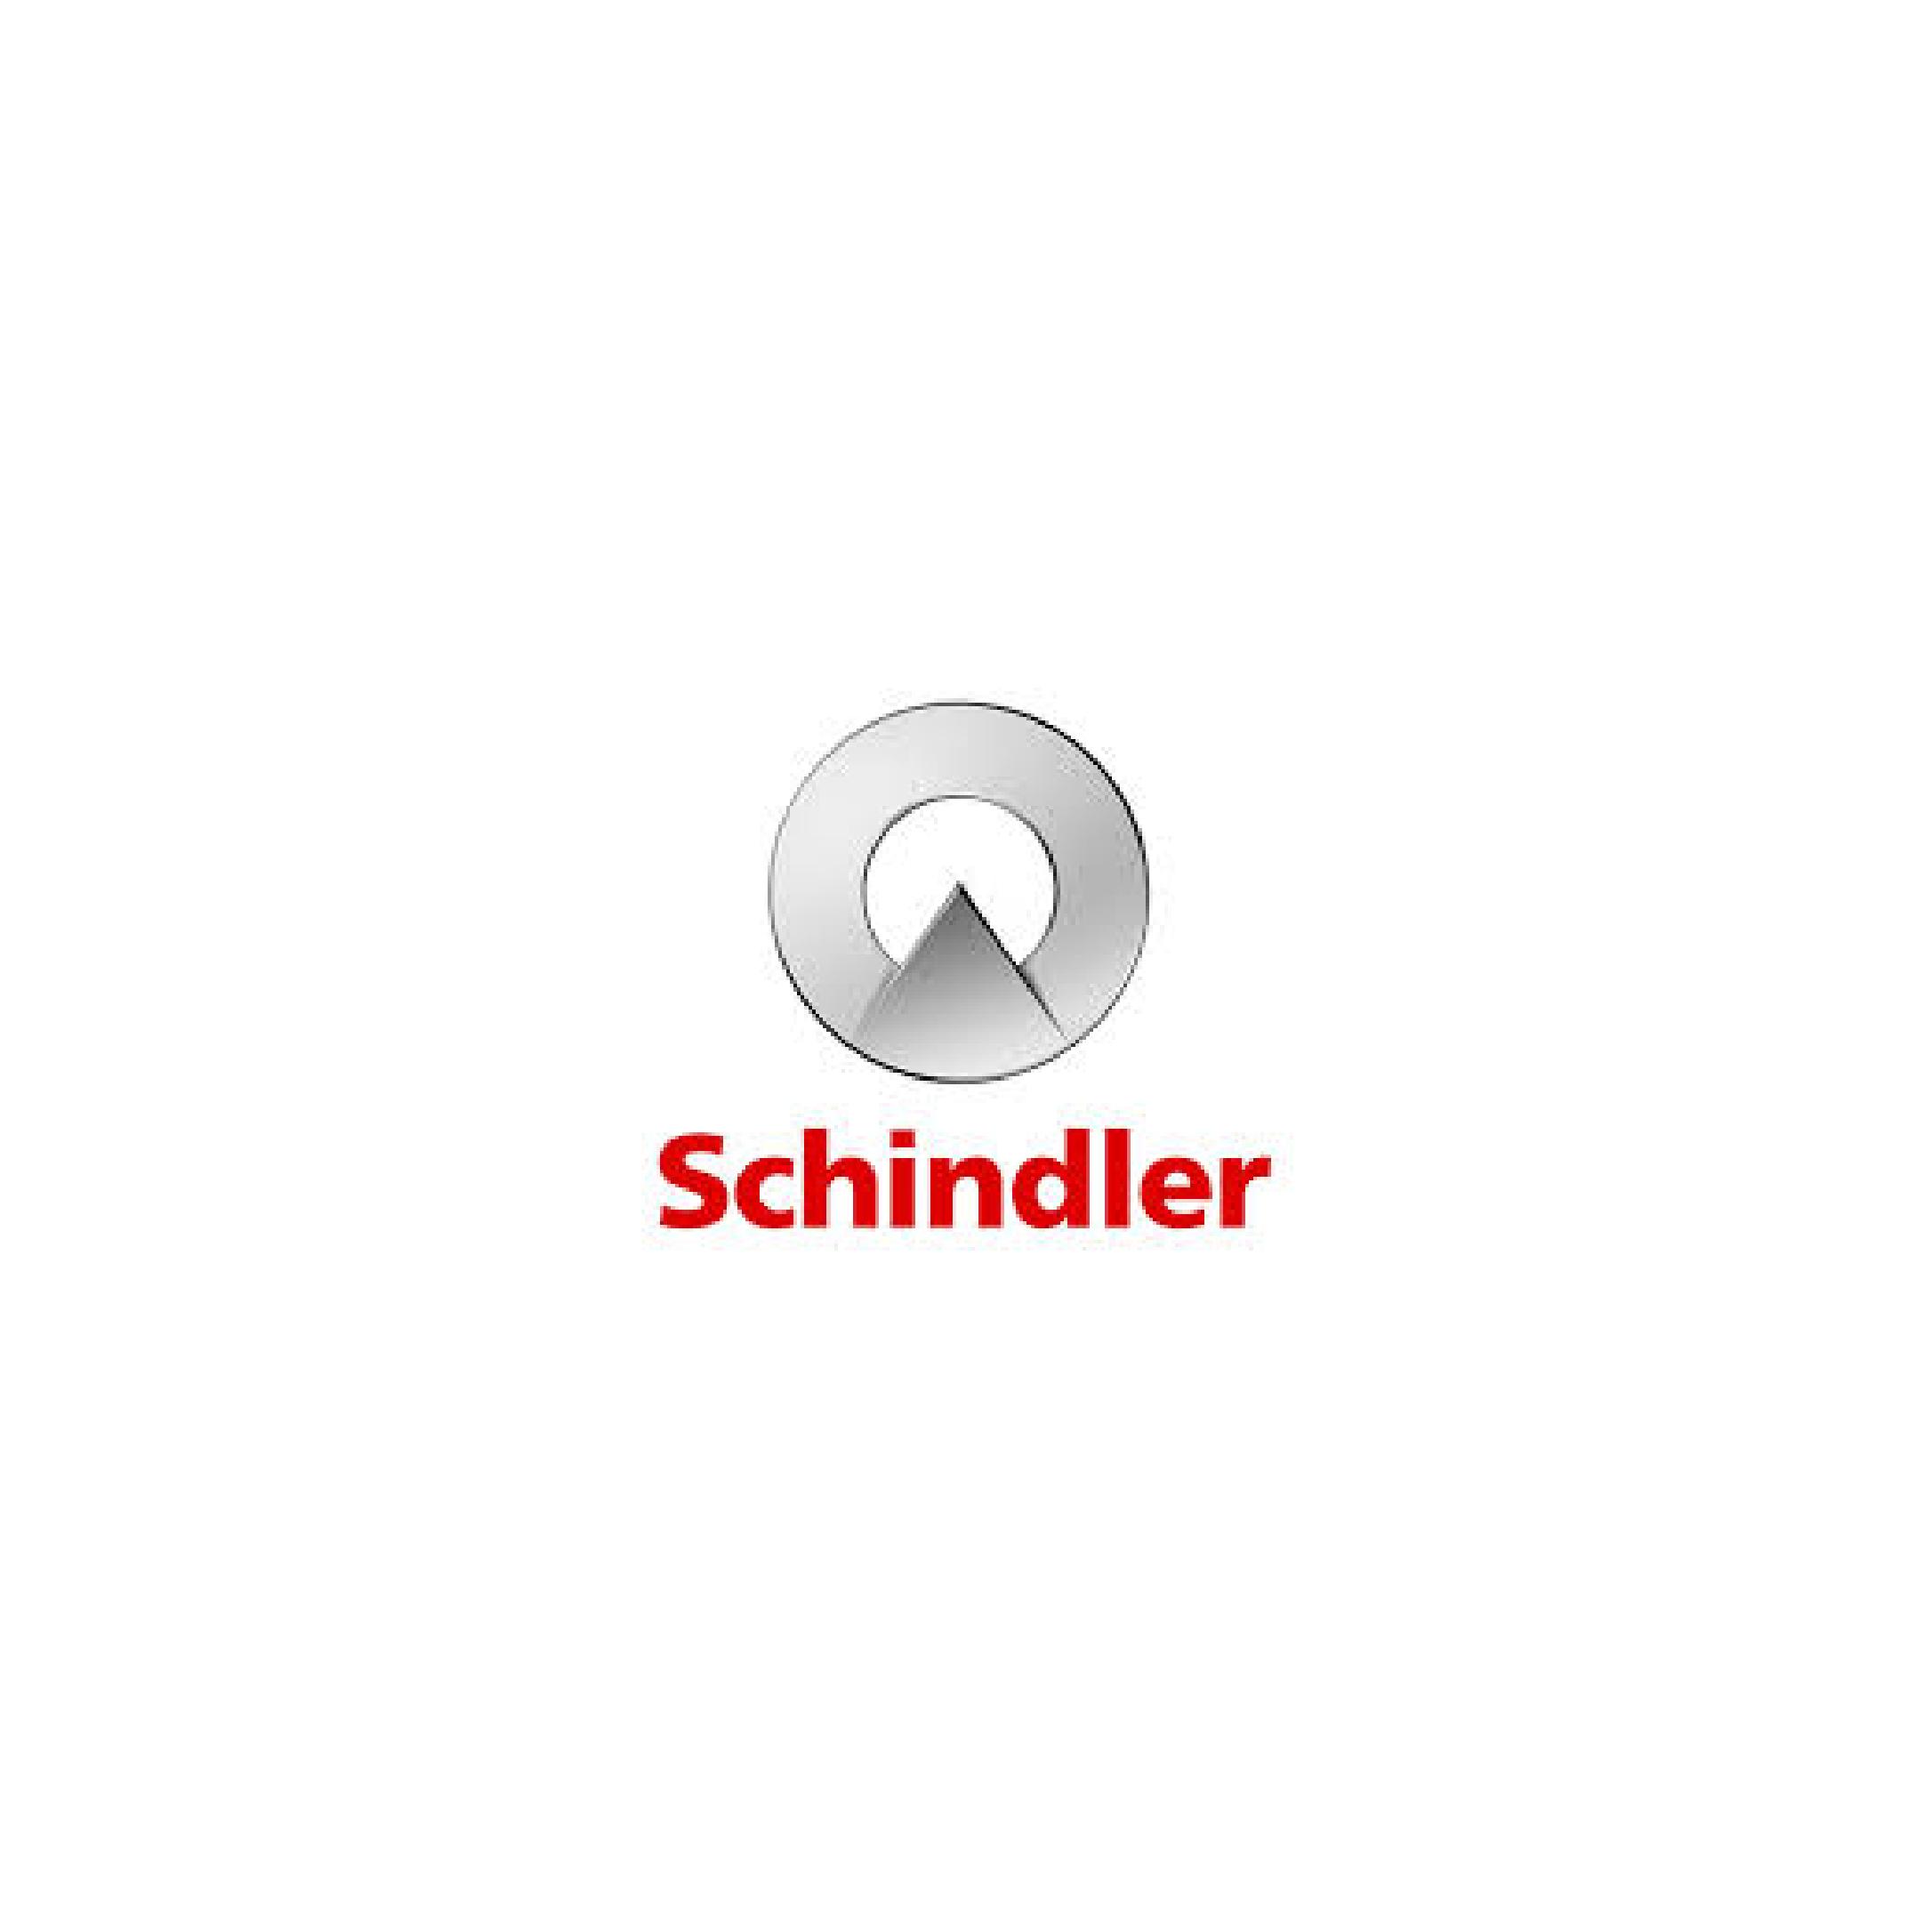 DialOnce-Schindler